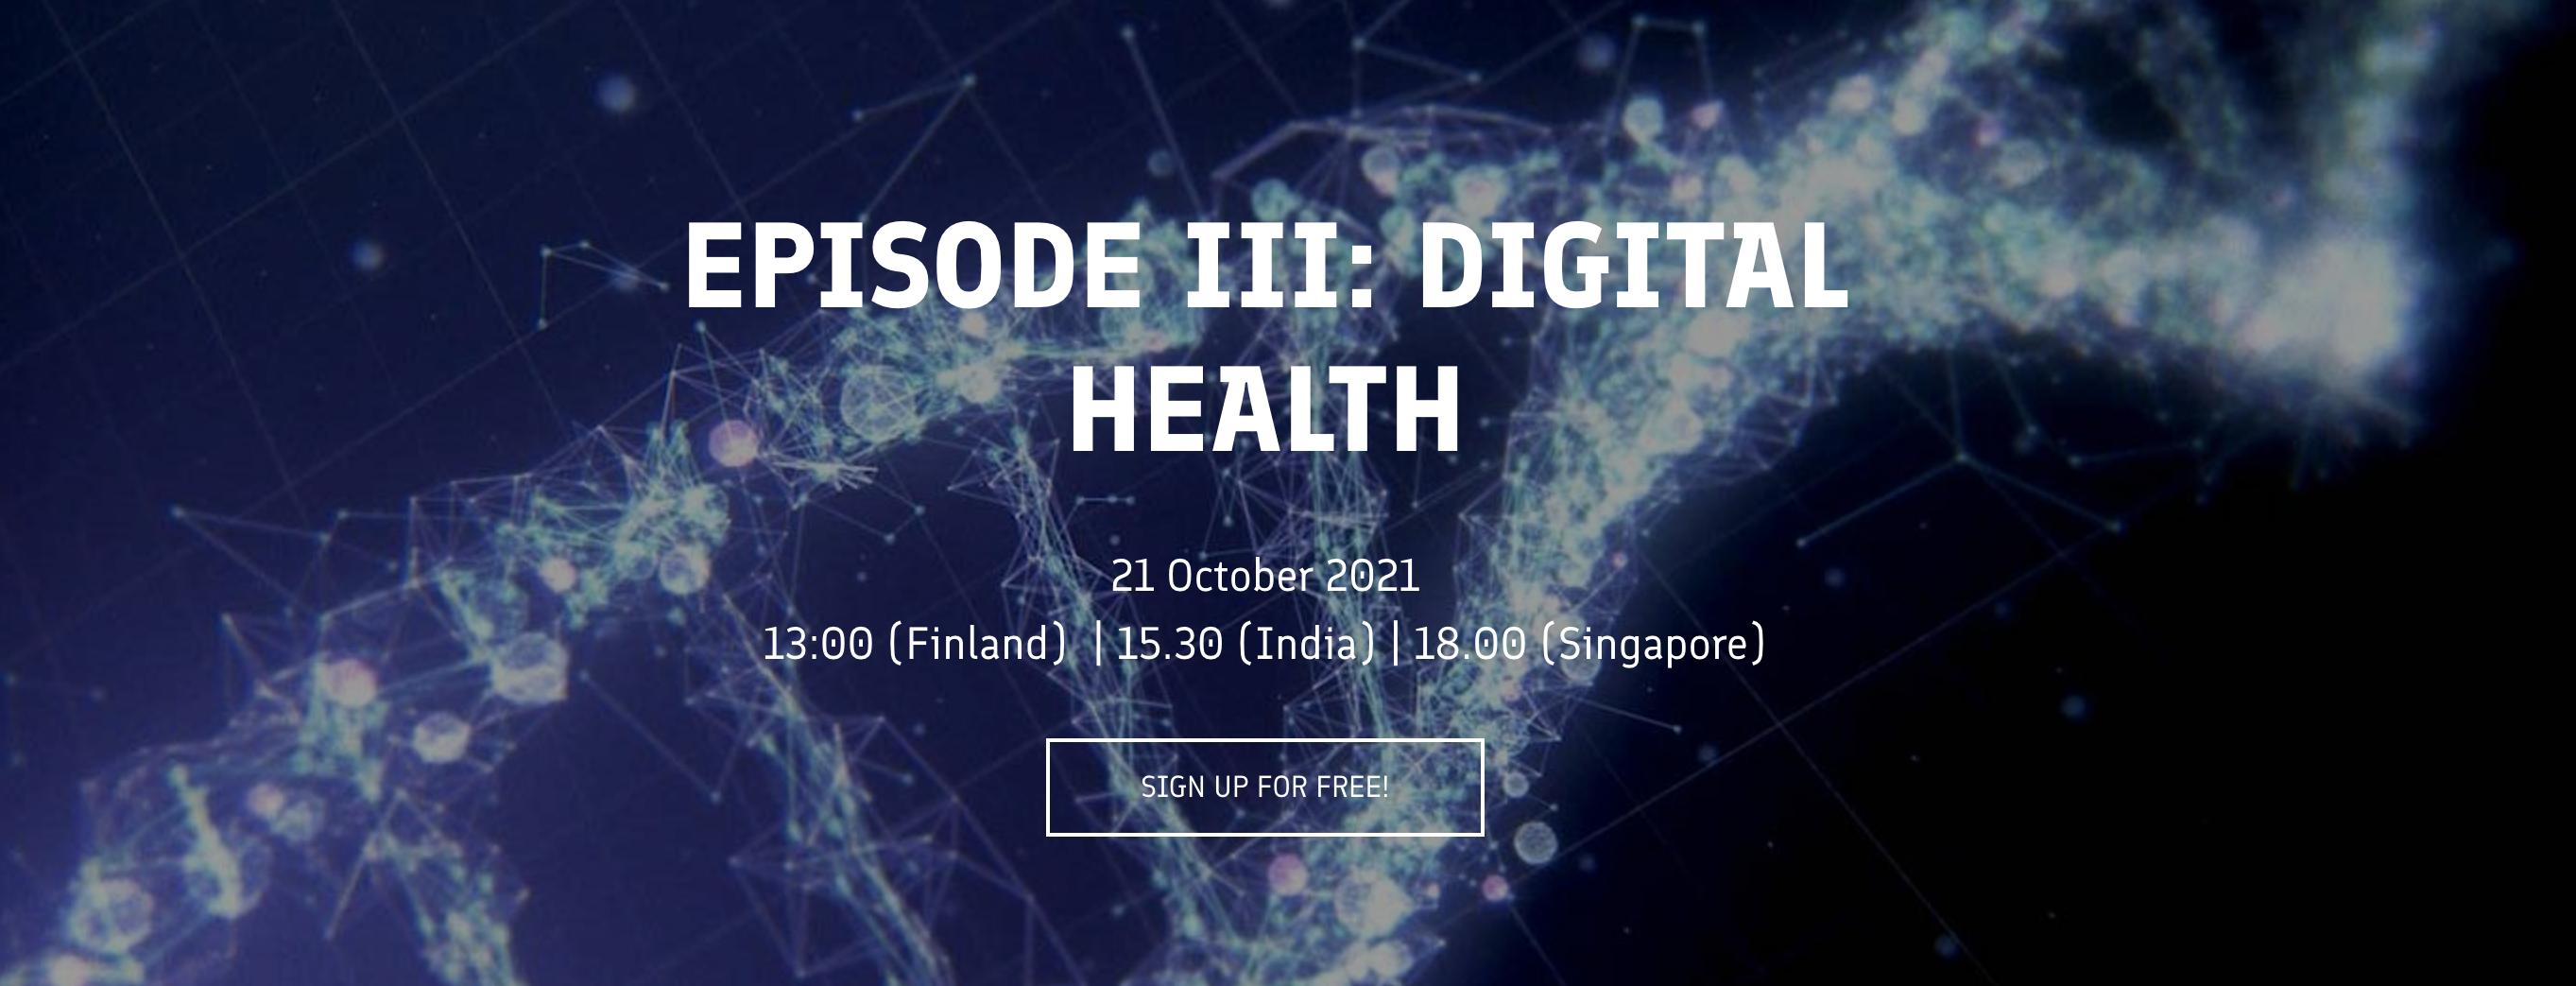 Future is made in Finland Webinar Episode III: Digital Health